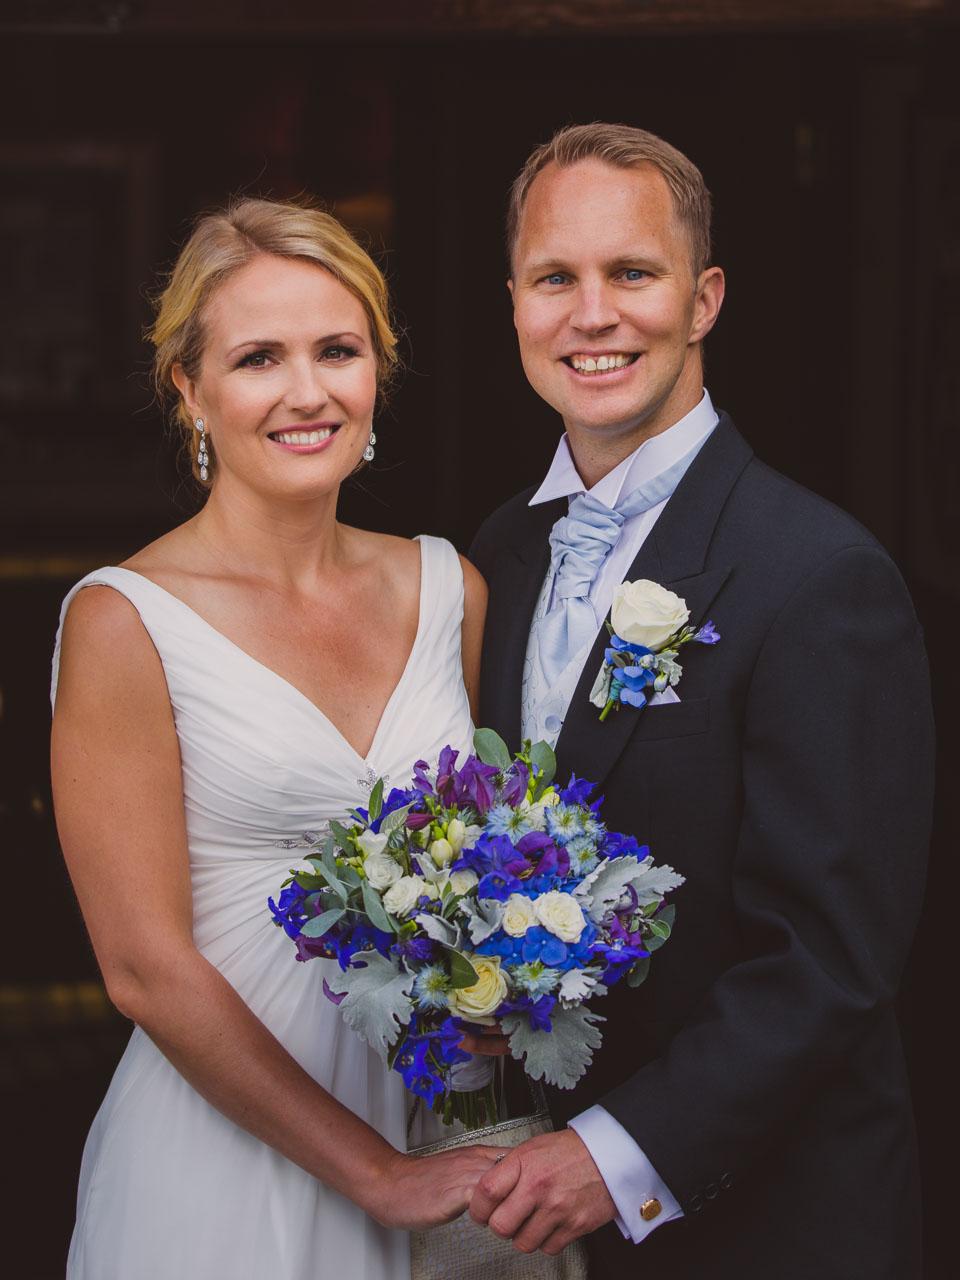 f4e65c3c76a6 brollopsfotograf-stockholm-gustavsberg-wedding-photographer-sweden-3 ...